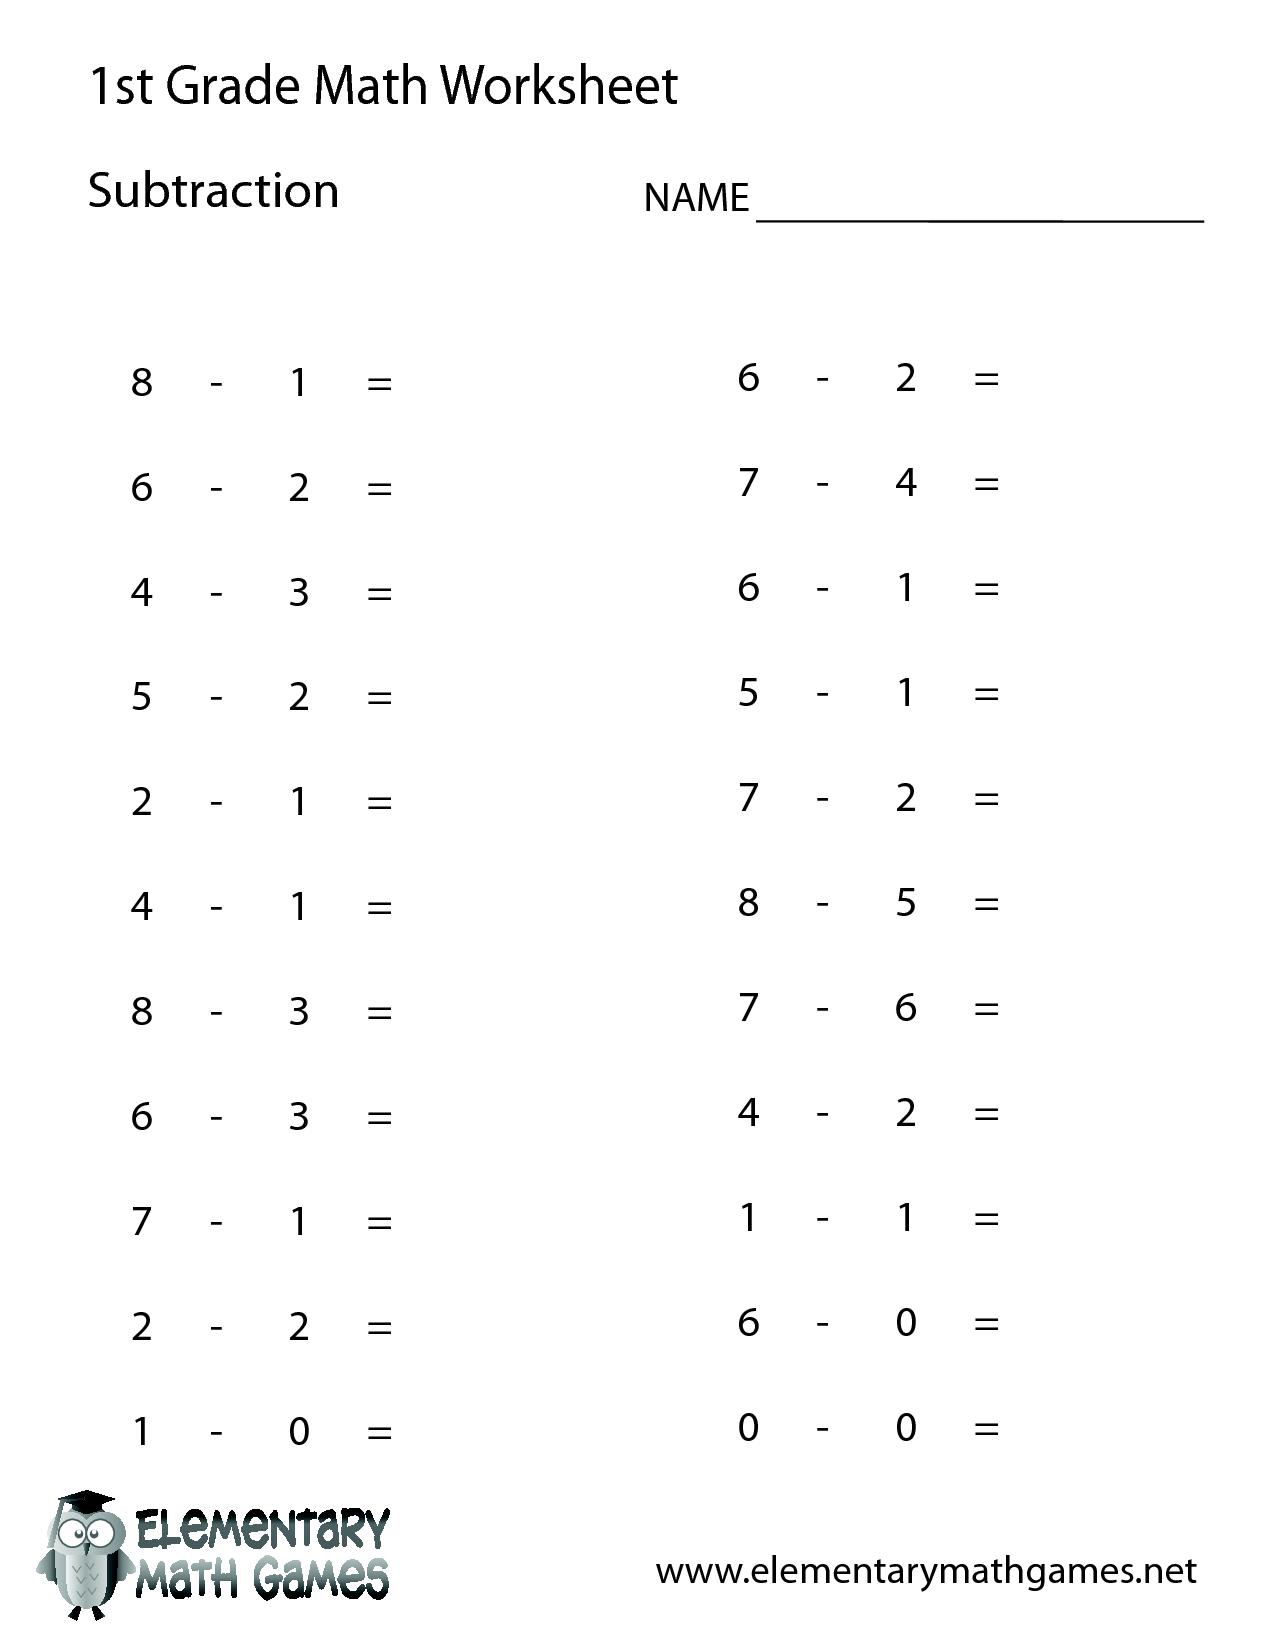 1St Grade Math Worksheets | 1St Grade Math | 1St Grade Math | Free Printable Math Worksheets For 1St Grade Addition